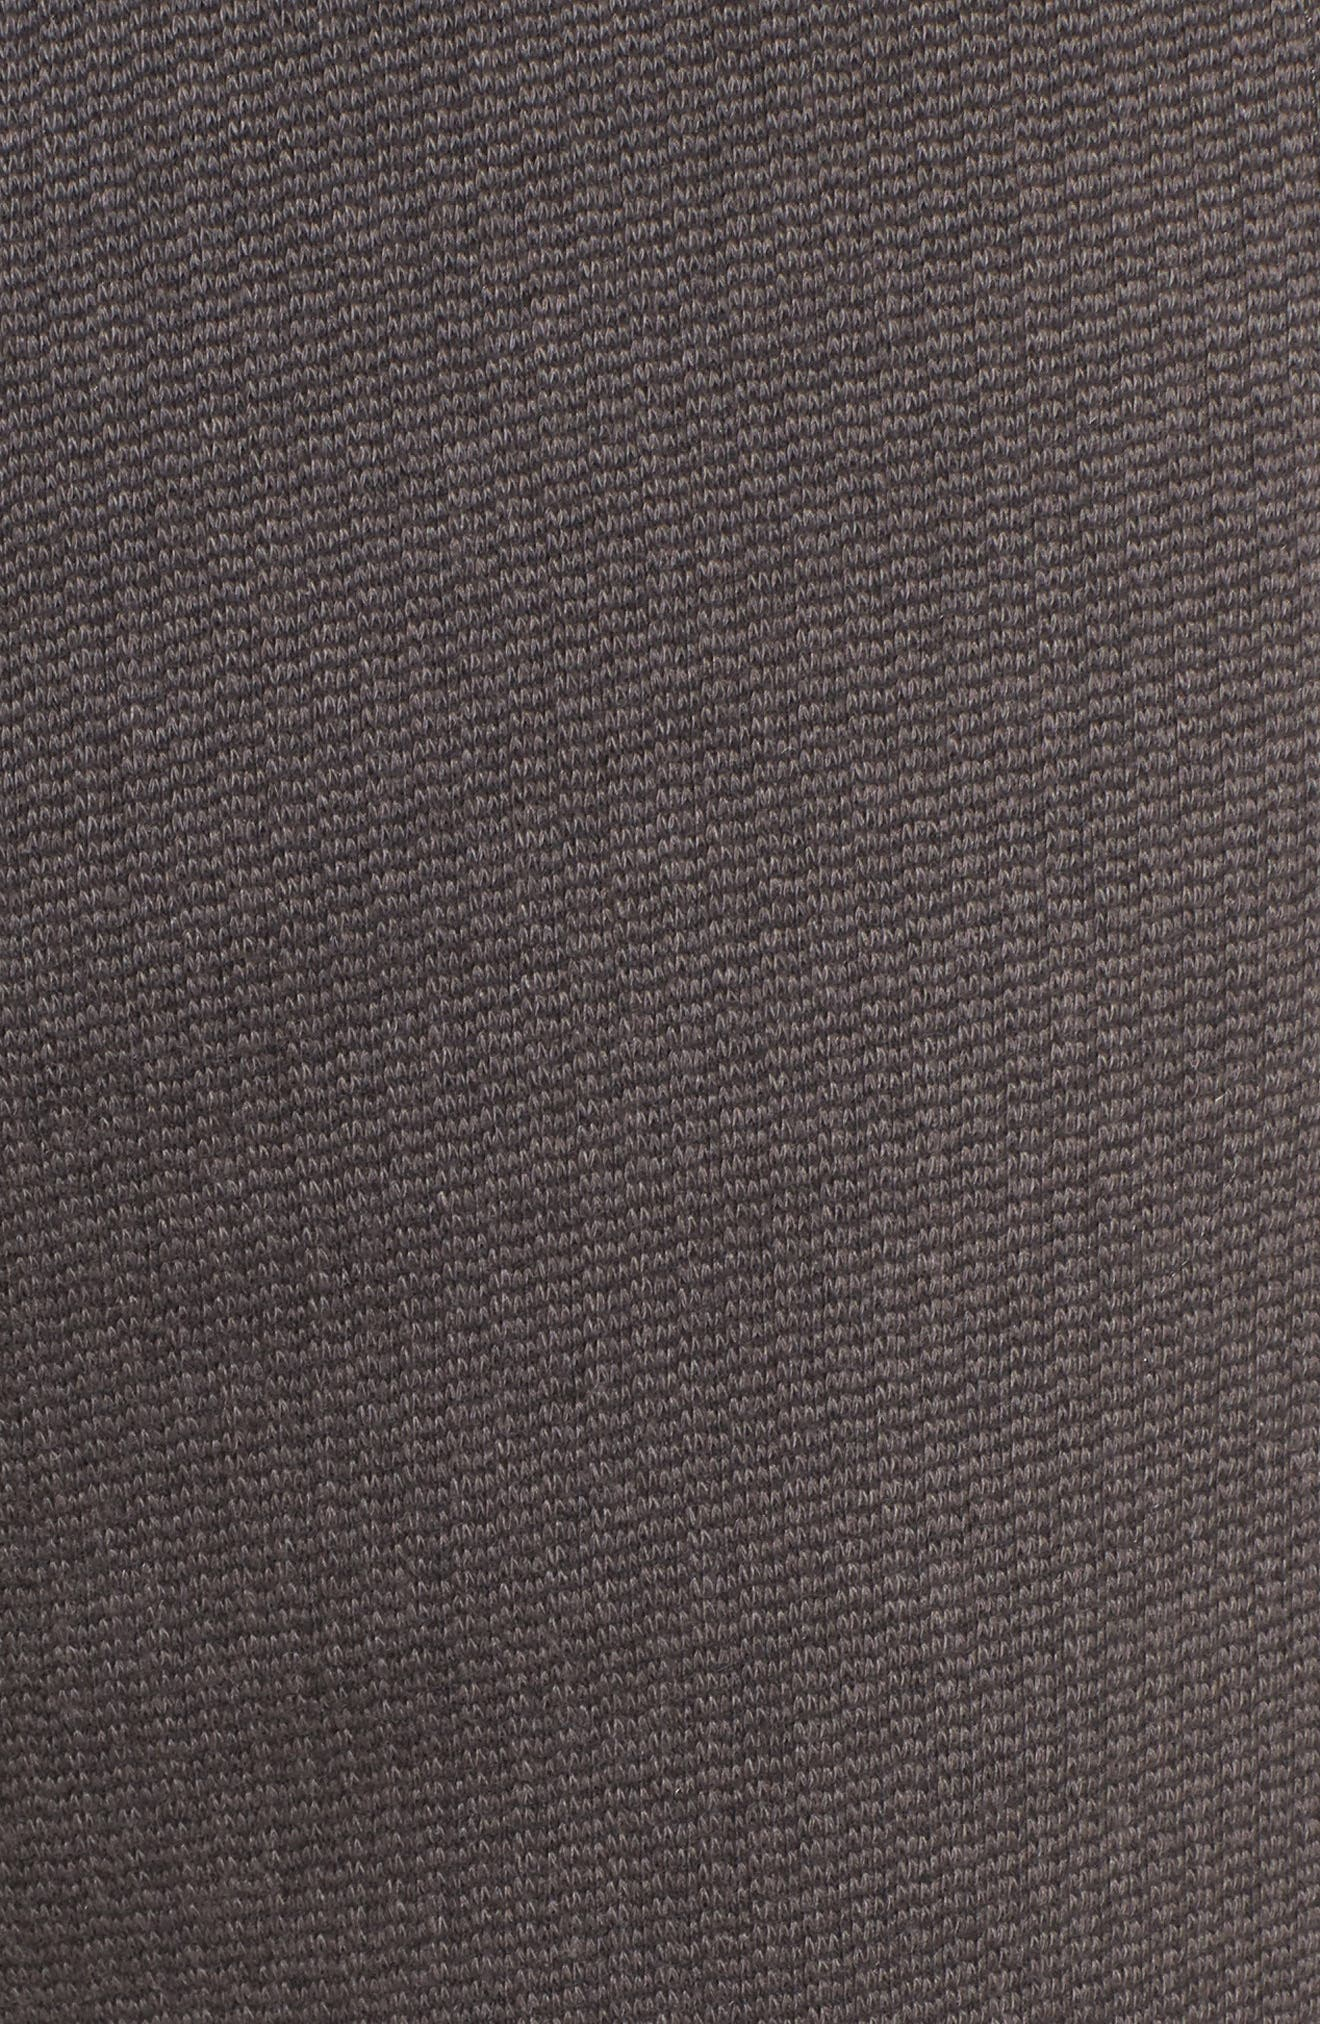 Hudson Sweatpants,                             Alternate thumbnail 5, color,                             001